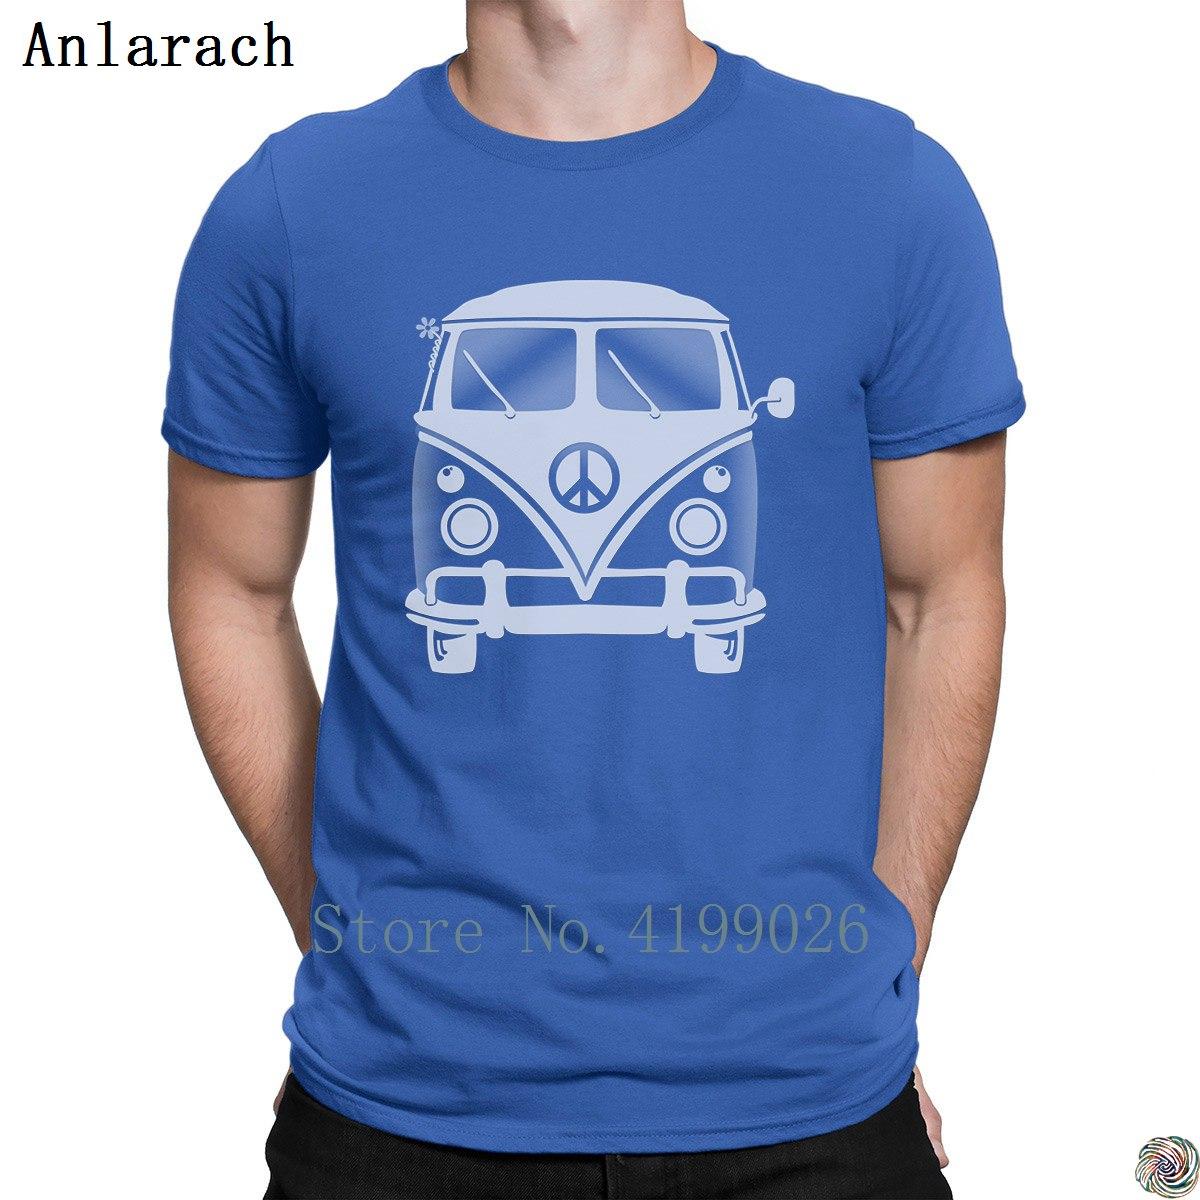 Hippie Van T-shirt Quirky Designs The New Short Sleeve Men's Tshirt 2018 Unisex HipHop Tee Shirt Vintage